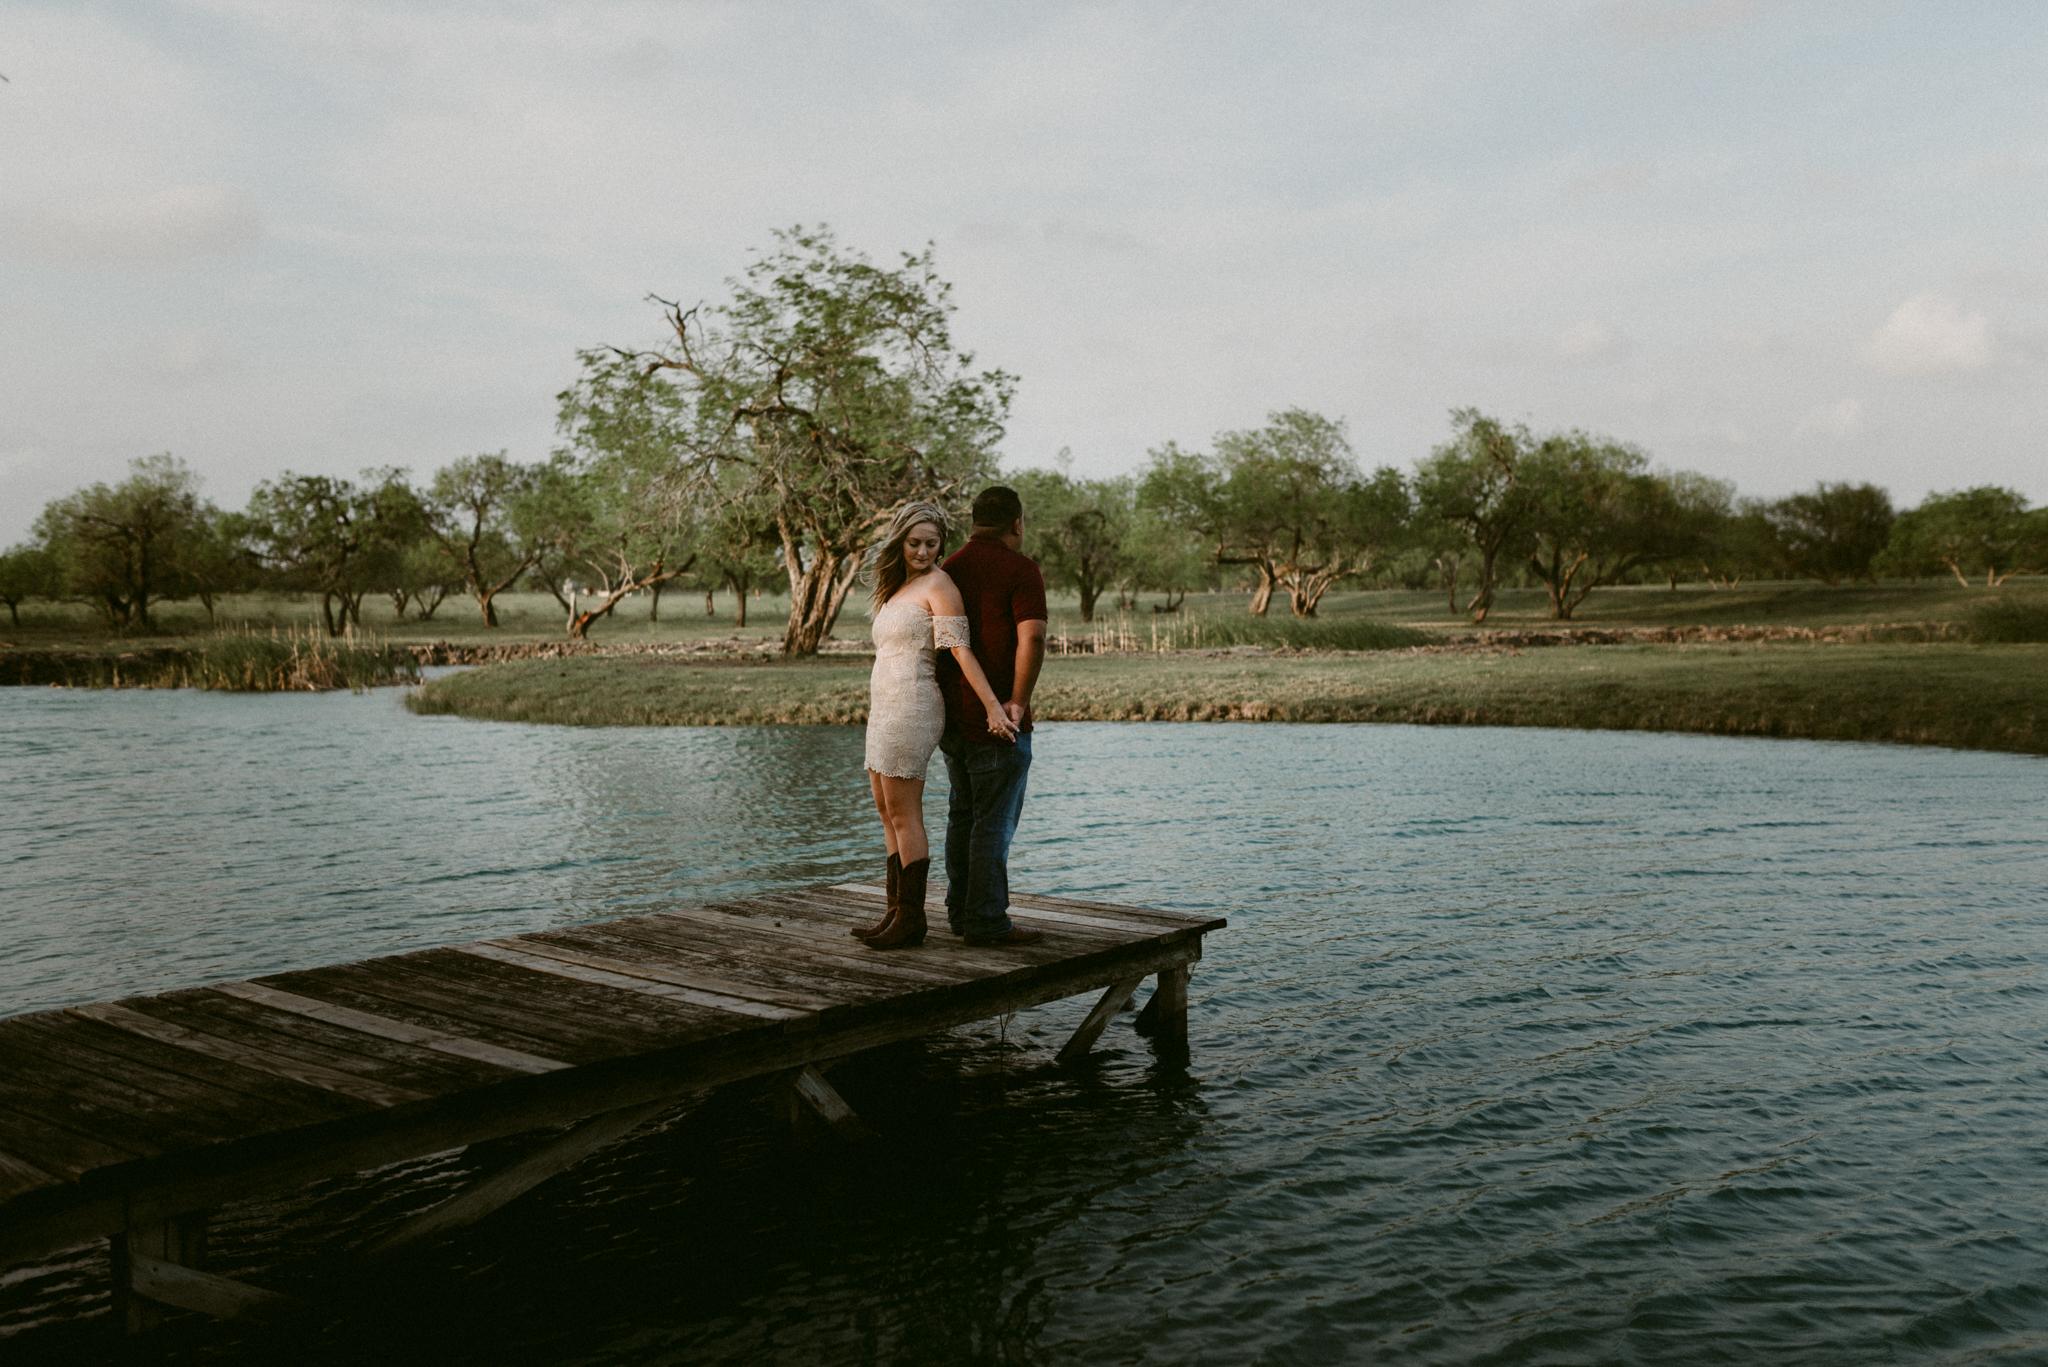 Intimate-Rustic-Bohemian-Engagement-Session-The-Ranch-at-San-Patricio-Corpus-Christi-Wedding-Photographer